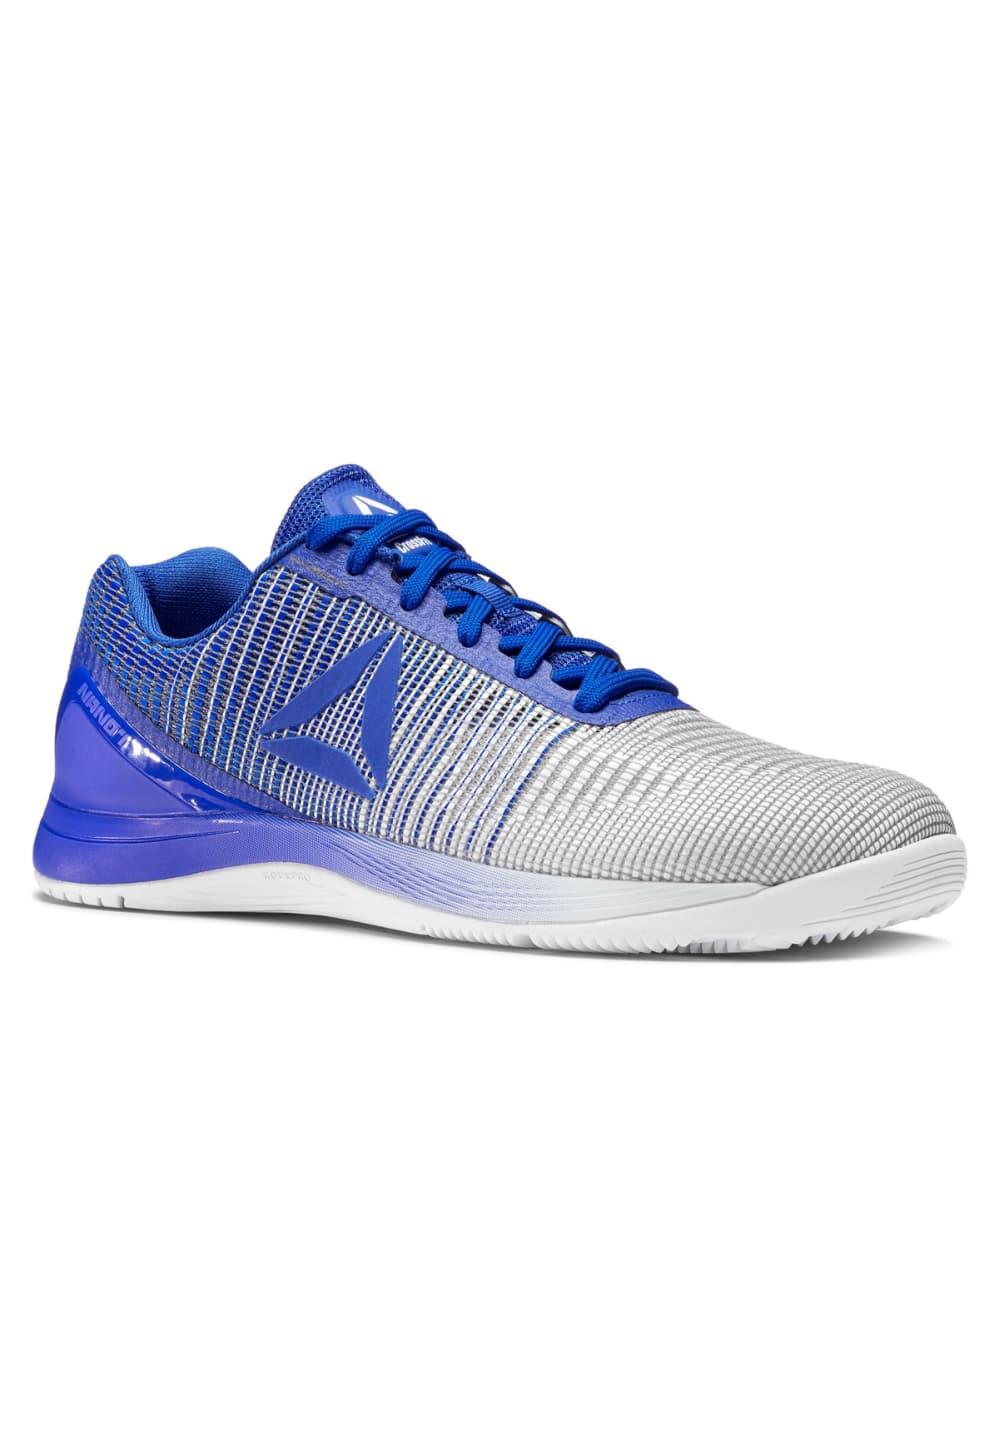 38dad24e Reebok R Crossfit Nano 7 - Fitness shoes for Men - Blue